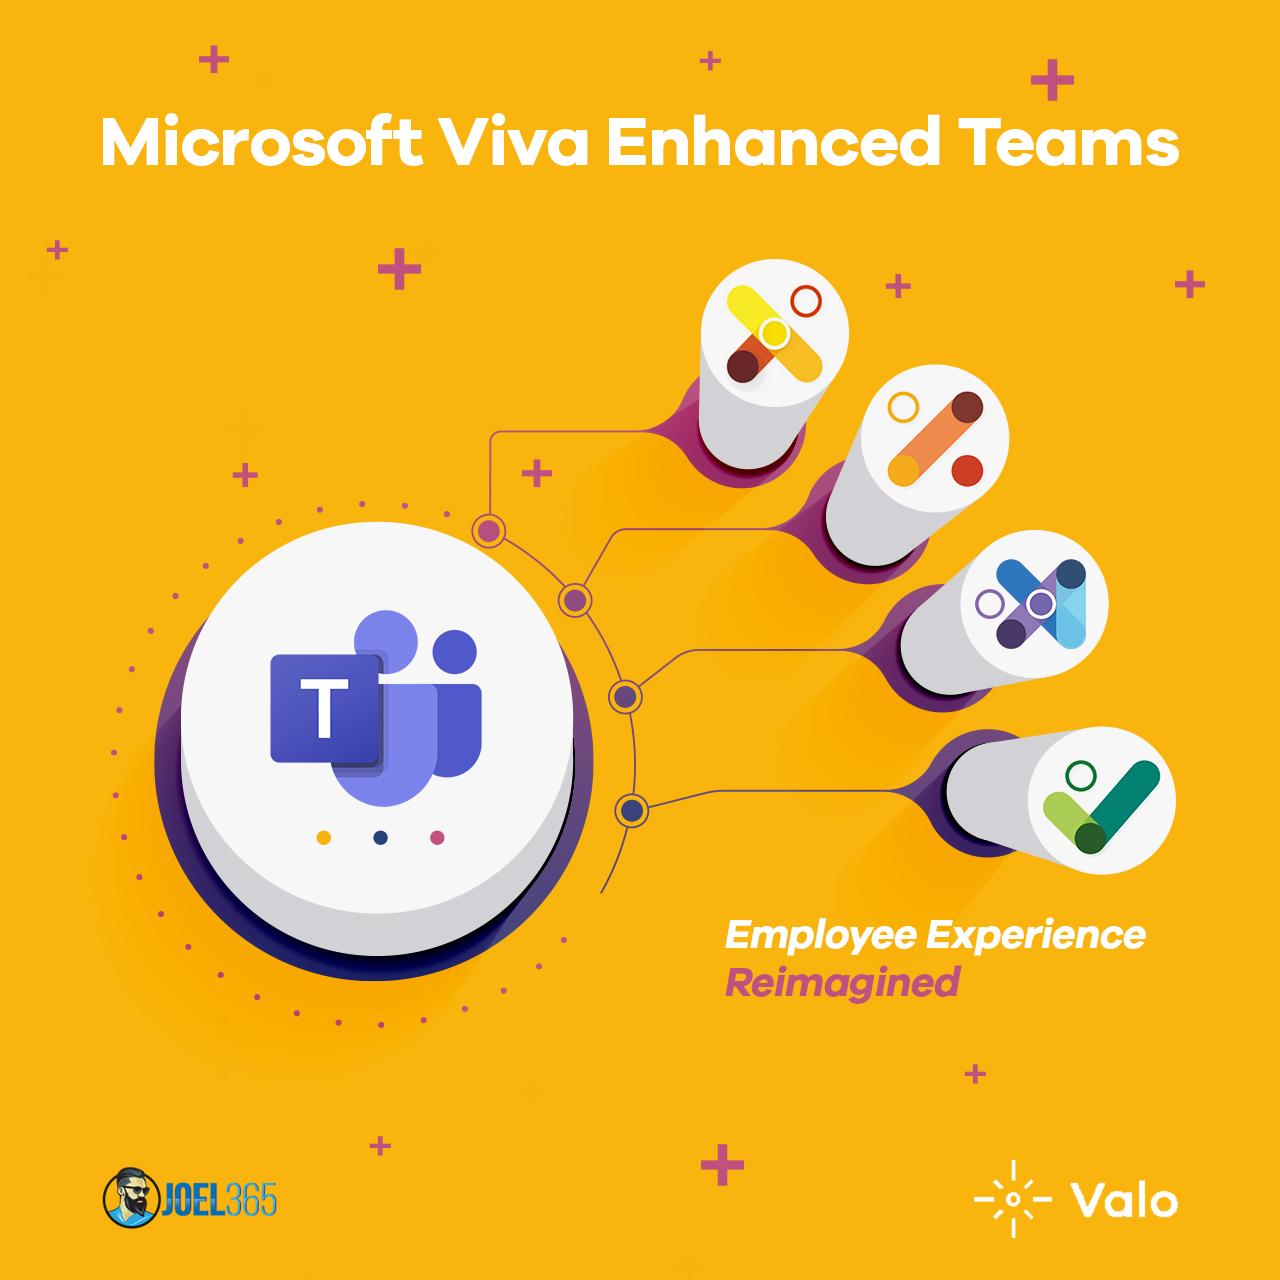 Microsoft Viva Enhanced Teams as A Platform